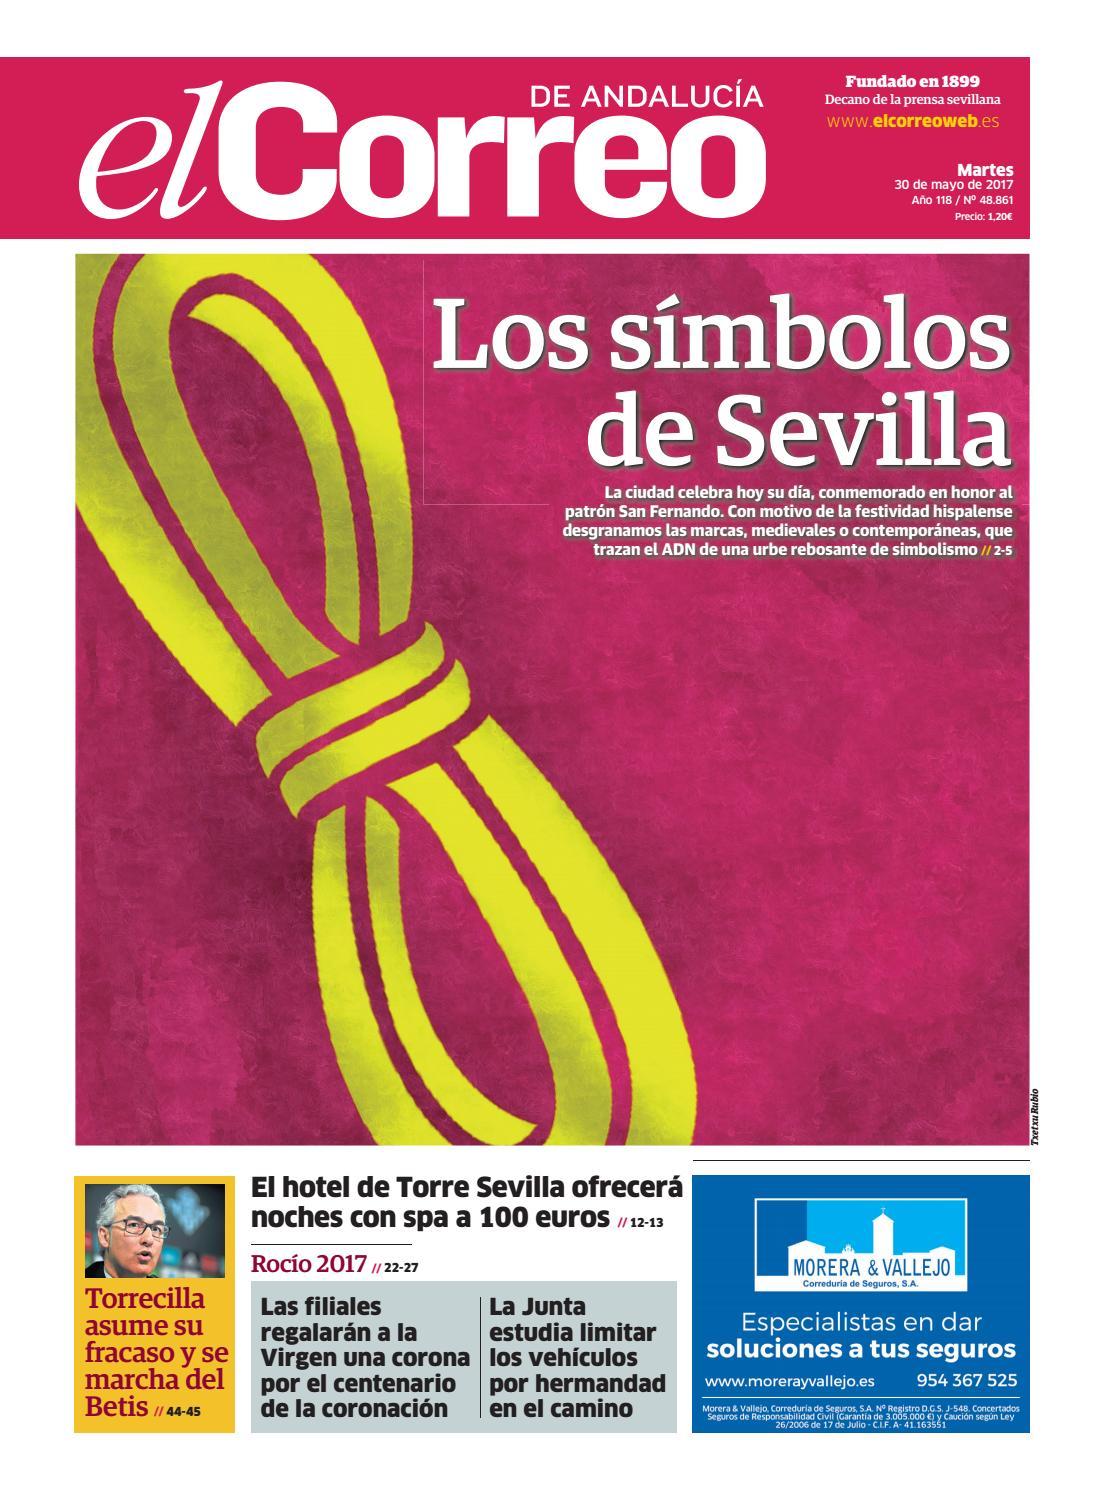 040c81b3aaf 30 05 2017 El Correo de Andalucía by EL CORREO DE ANDALUCÍA S.L. - issuu